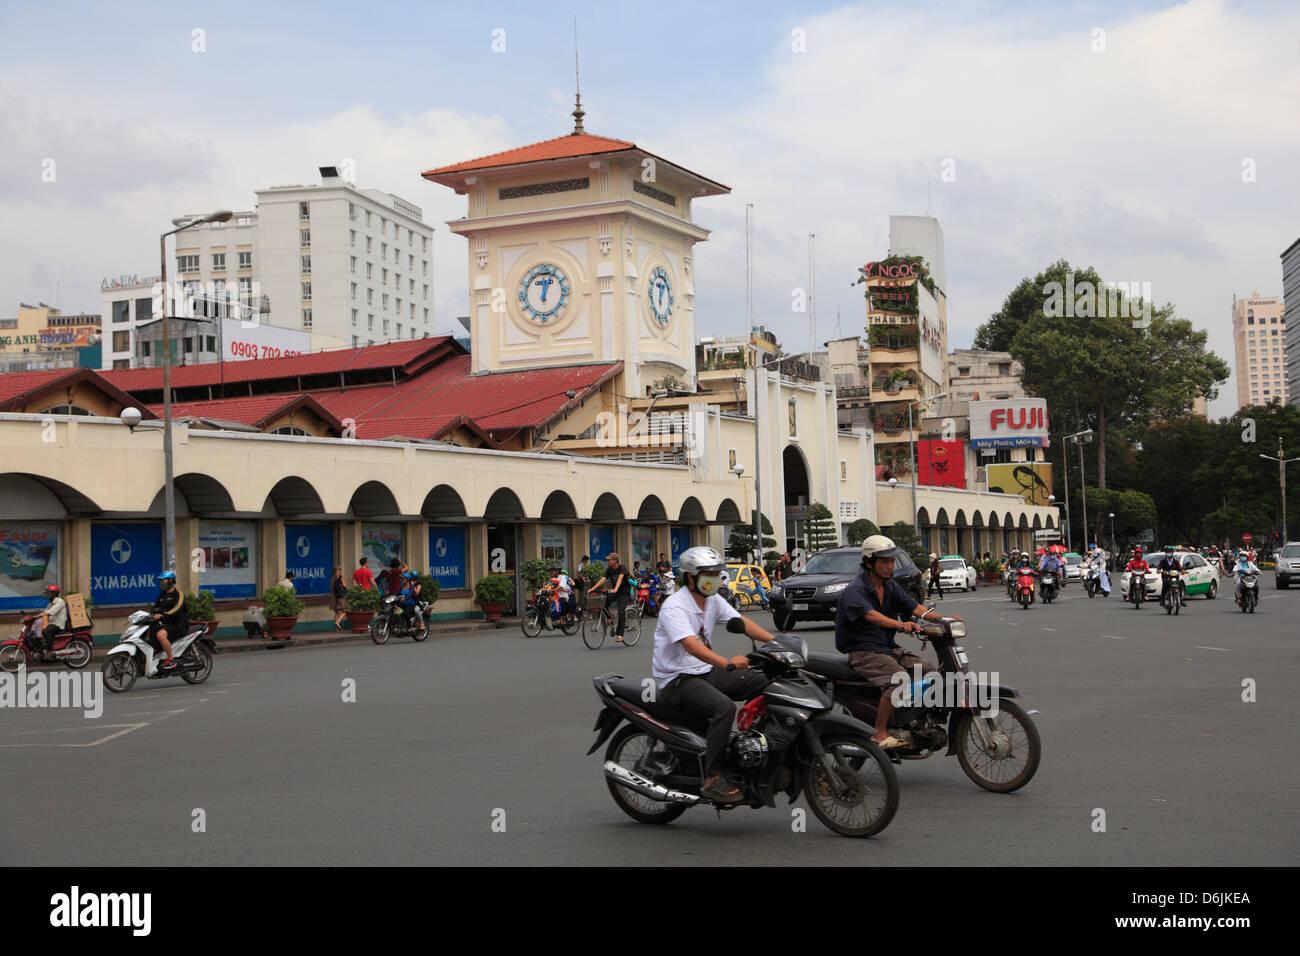 Ben Thanh Market, Ho Chi Minh City (Saigon), Vietnam, Indochina, Southeast Asia, Asia - Stock Image